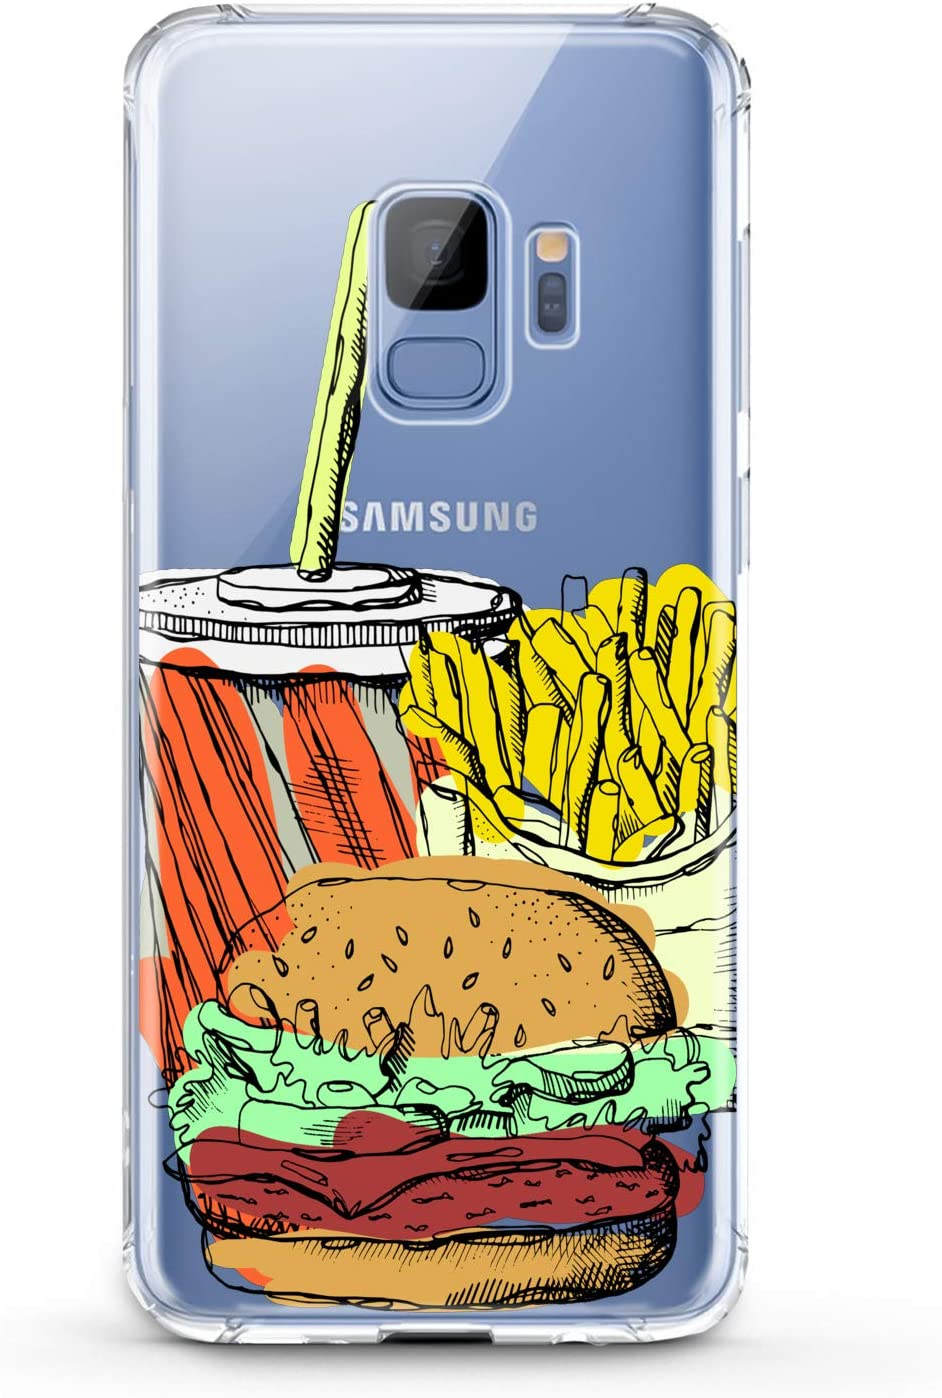 Anreda TPU Case Compatible with Samsung Galaxy J8 J7 Prime J6 Plus J5 J4 Core J2 Cover Flexible Slim fit Pattern Smooth Food Clear Cola Print Gift Burger Tasty Ladies Soft Potatoes Kids Girl Design